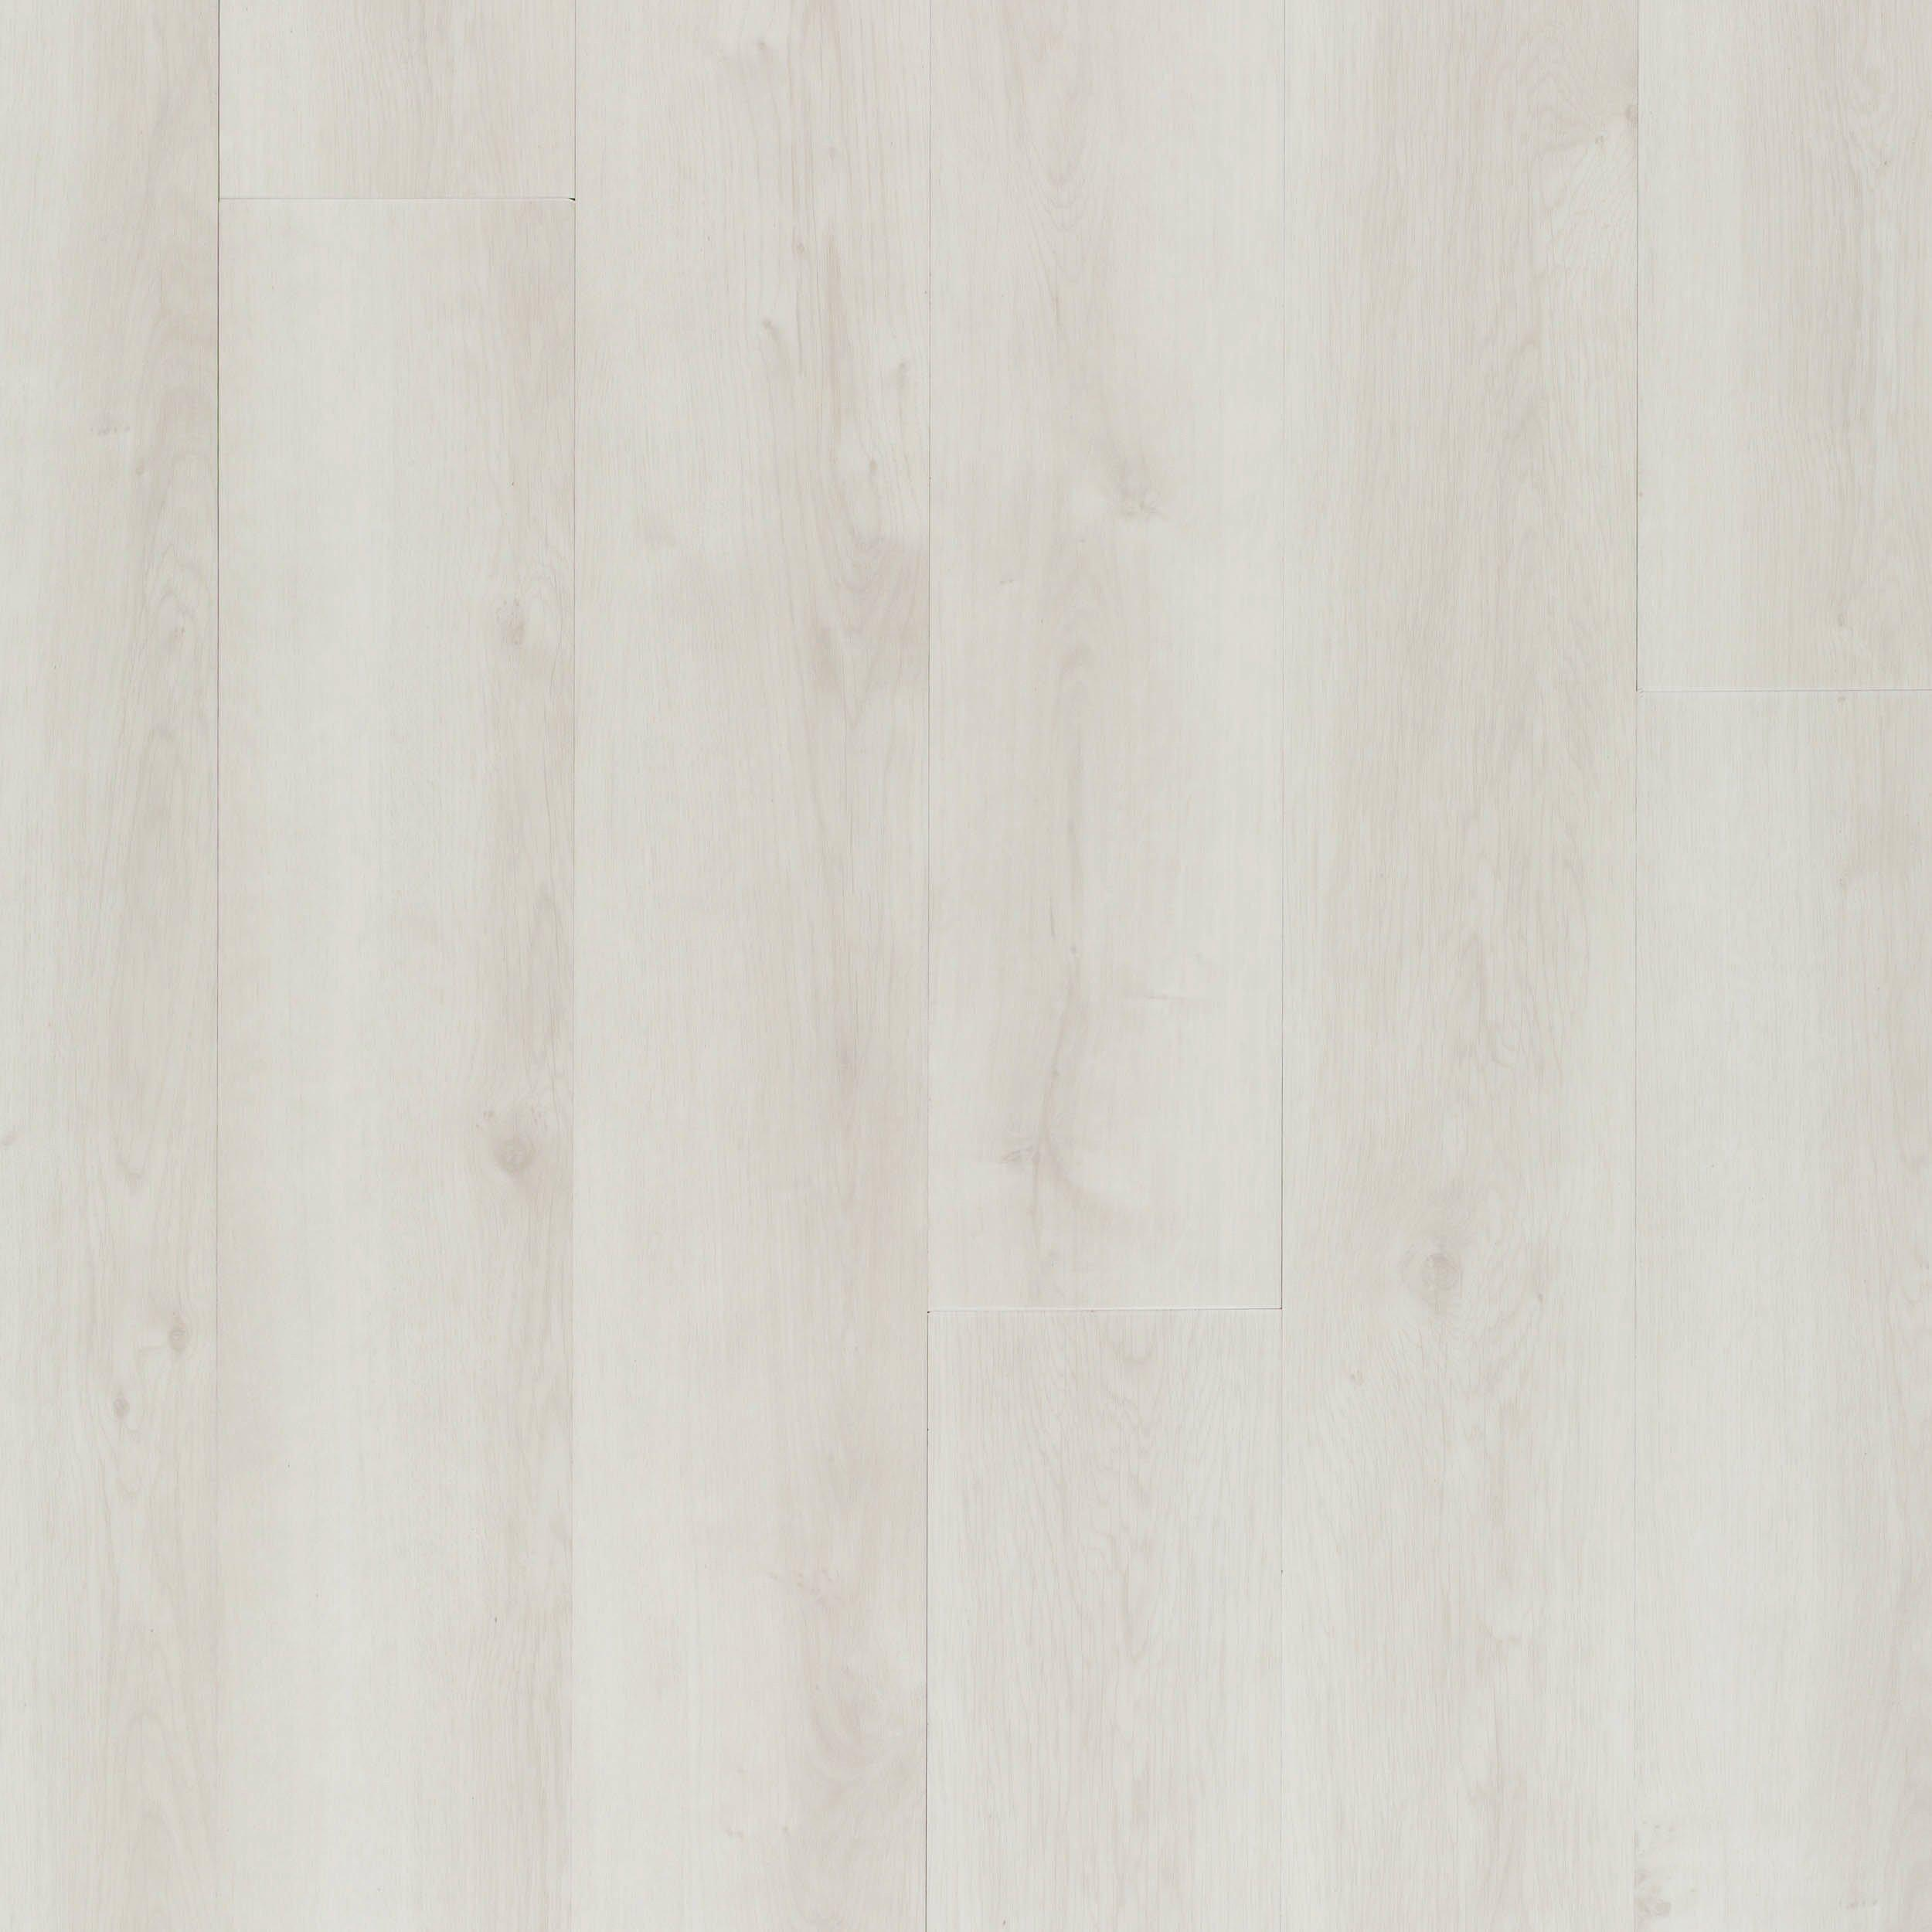 Linen High Gloss Rigid Core Luxury Vinyl Plank Cork Back Vinyl Flooring Luxury Vinyl Plank Vinyl Sheet Flooring